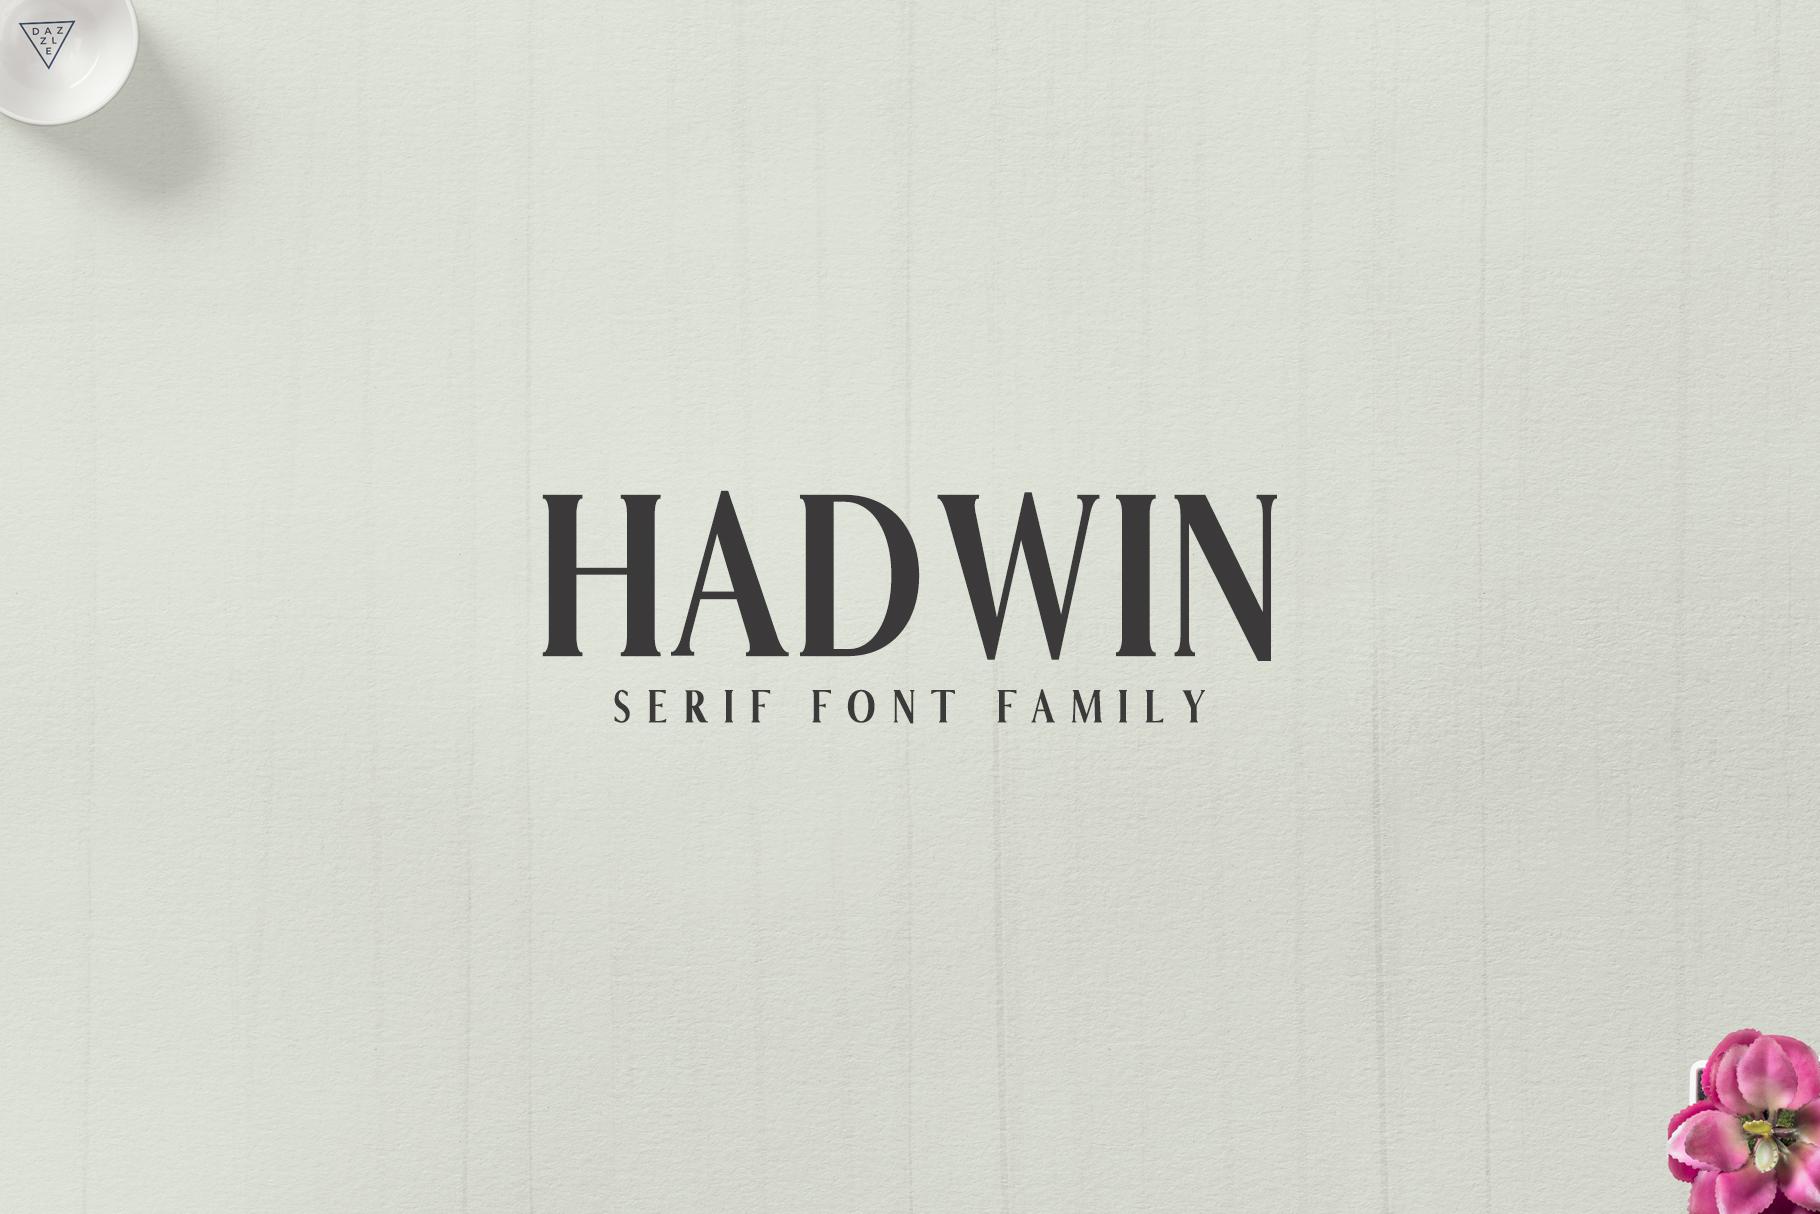 Hadwin Serif Typeface example image 1